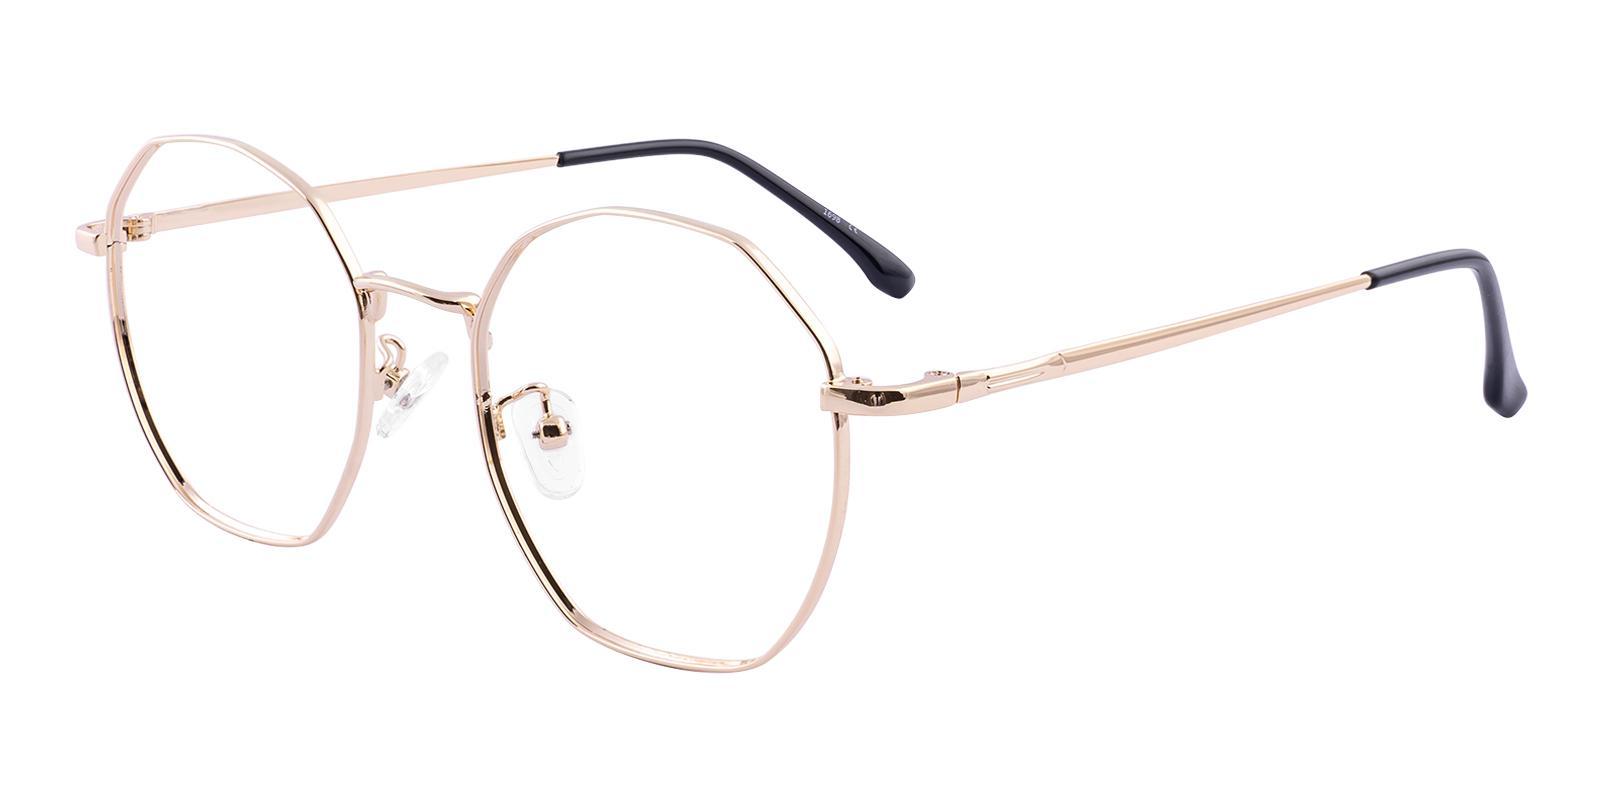 Jadeite Gold Metal Eyeglasses , Fashion , NosePads Frames from ABBE Glasses